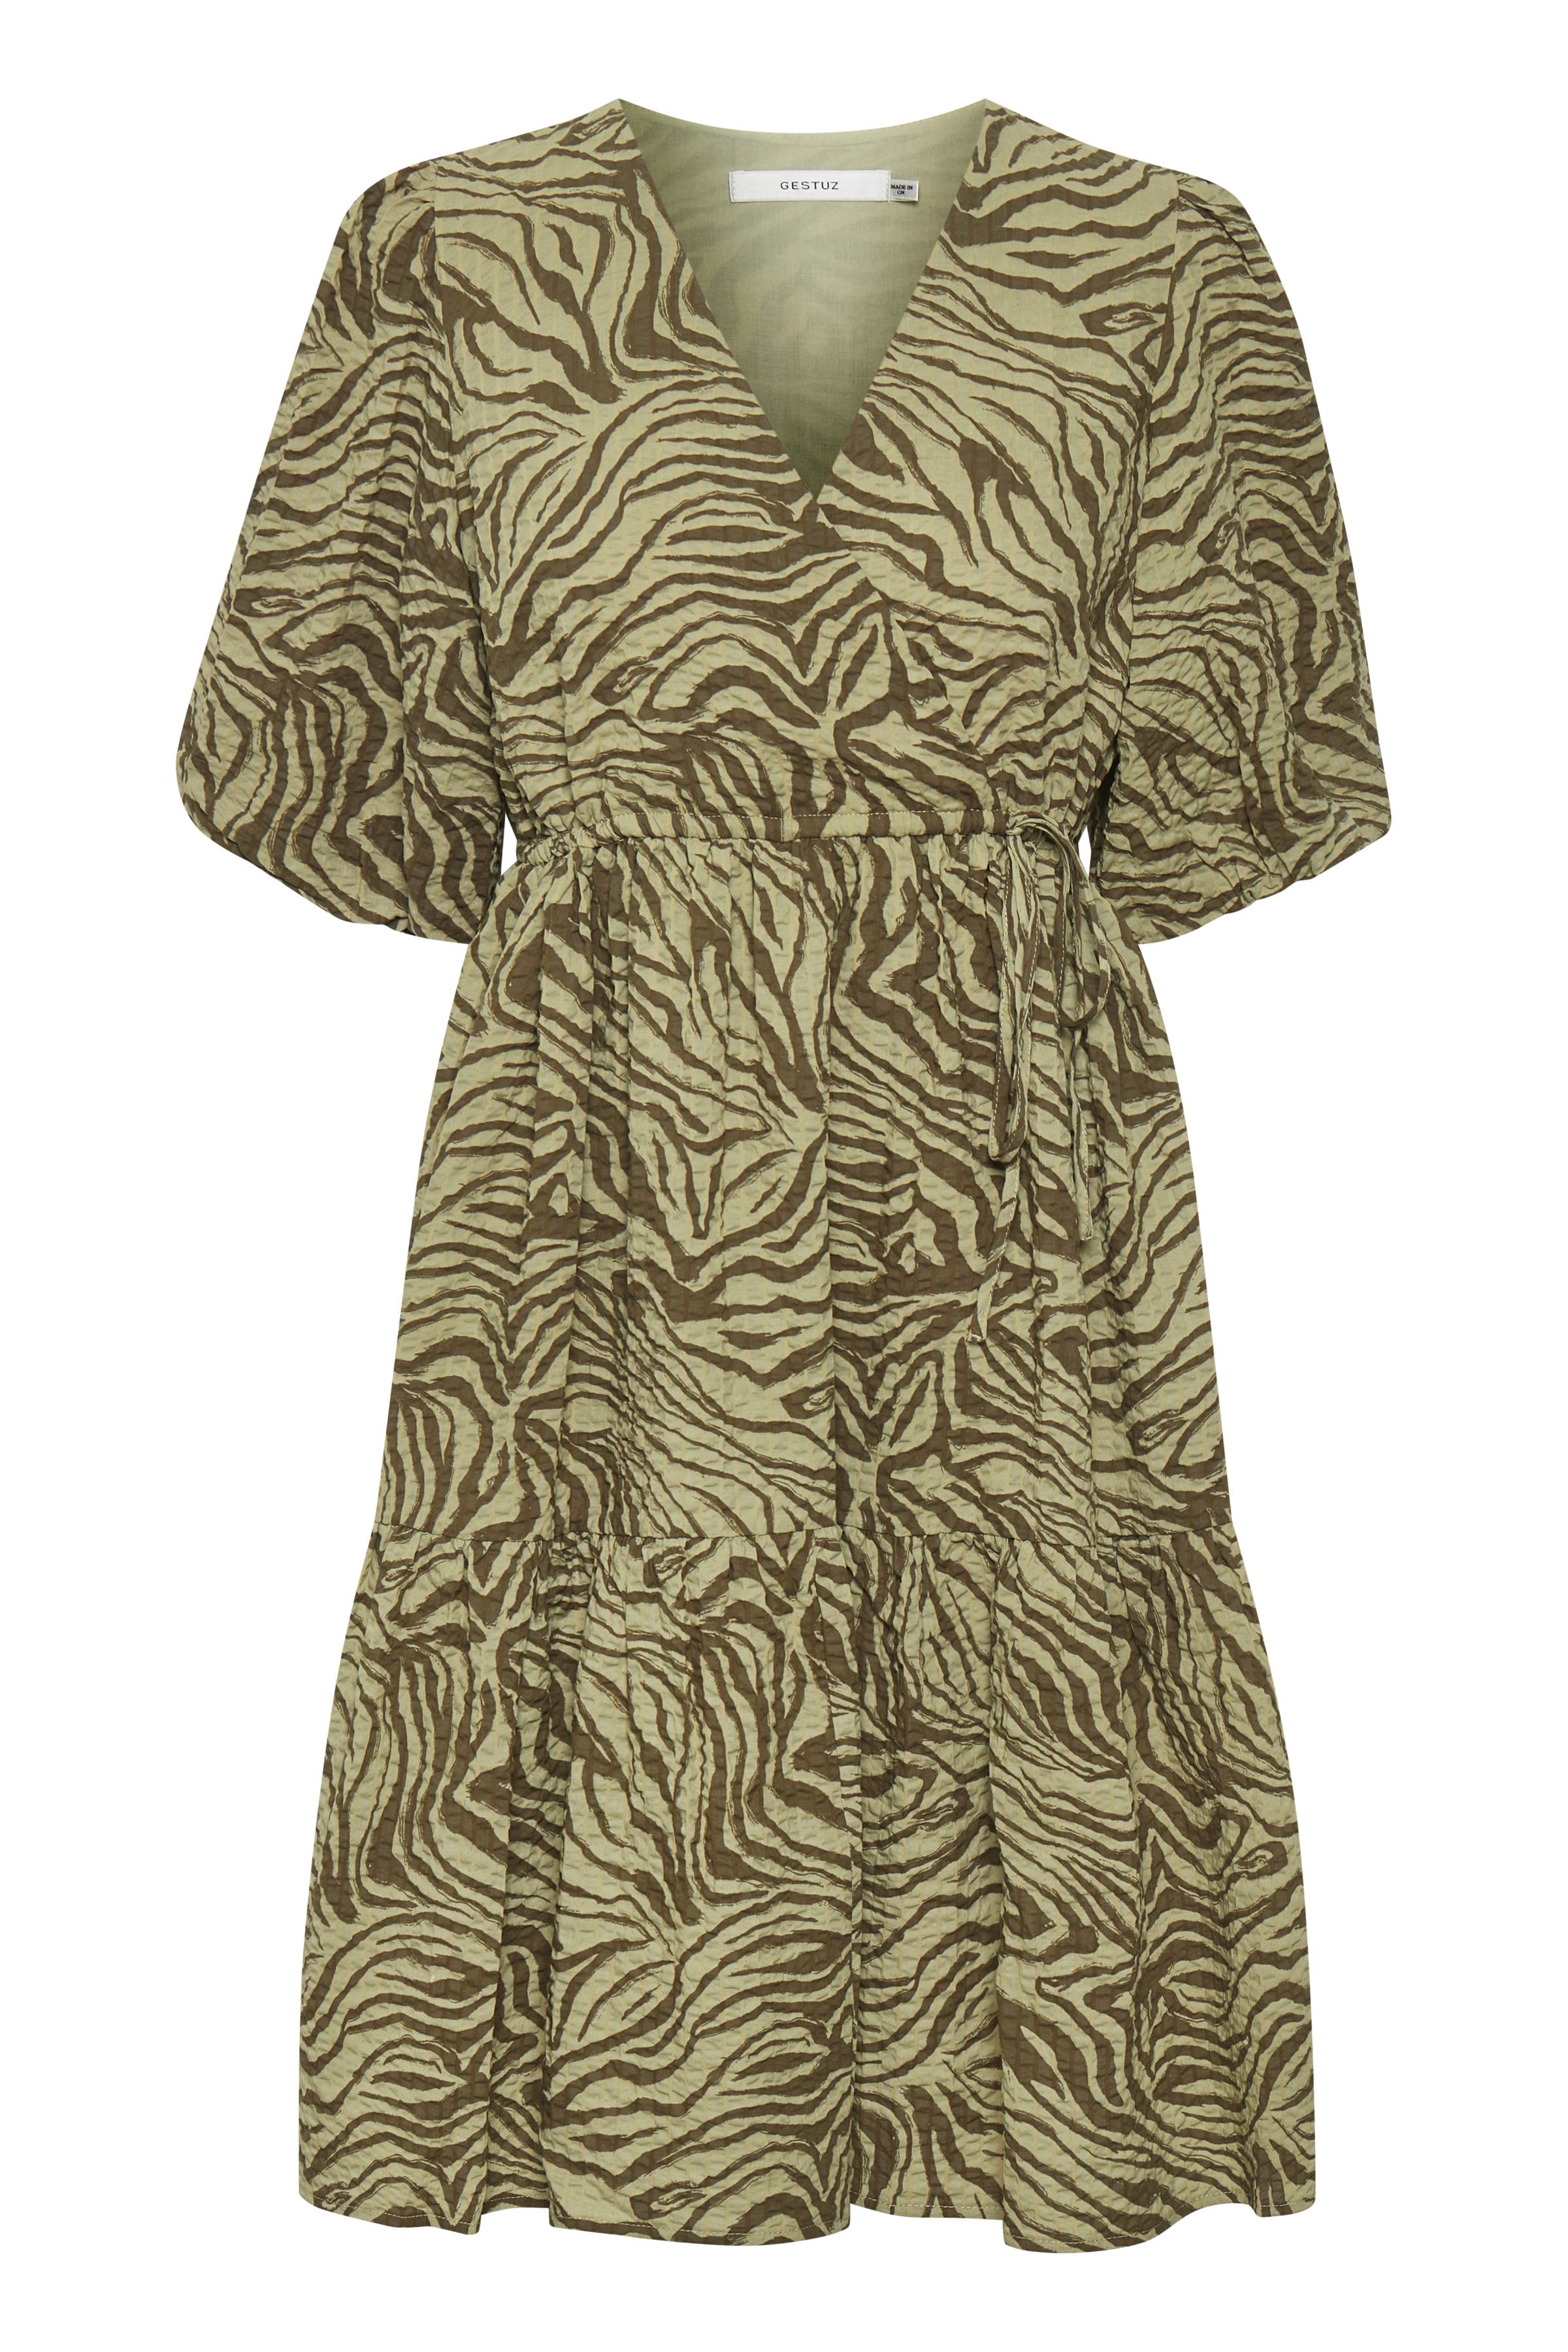 Gestuz AveryGZ kort kjole, elm zebra, 36